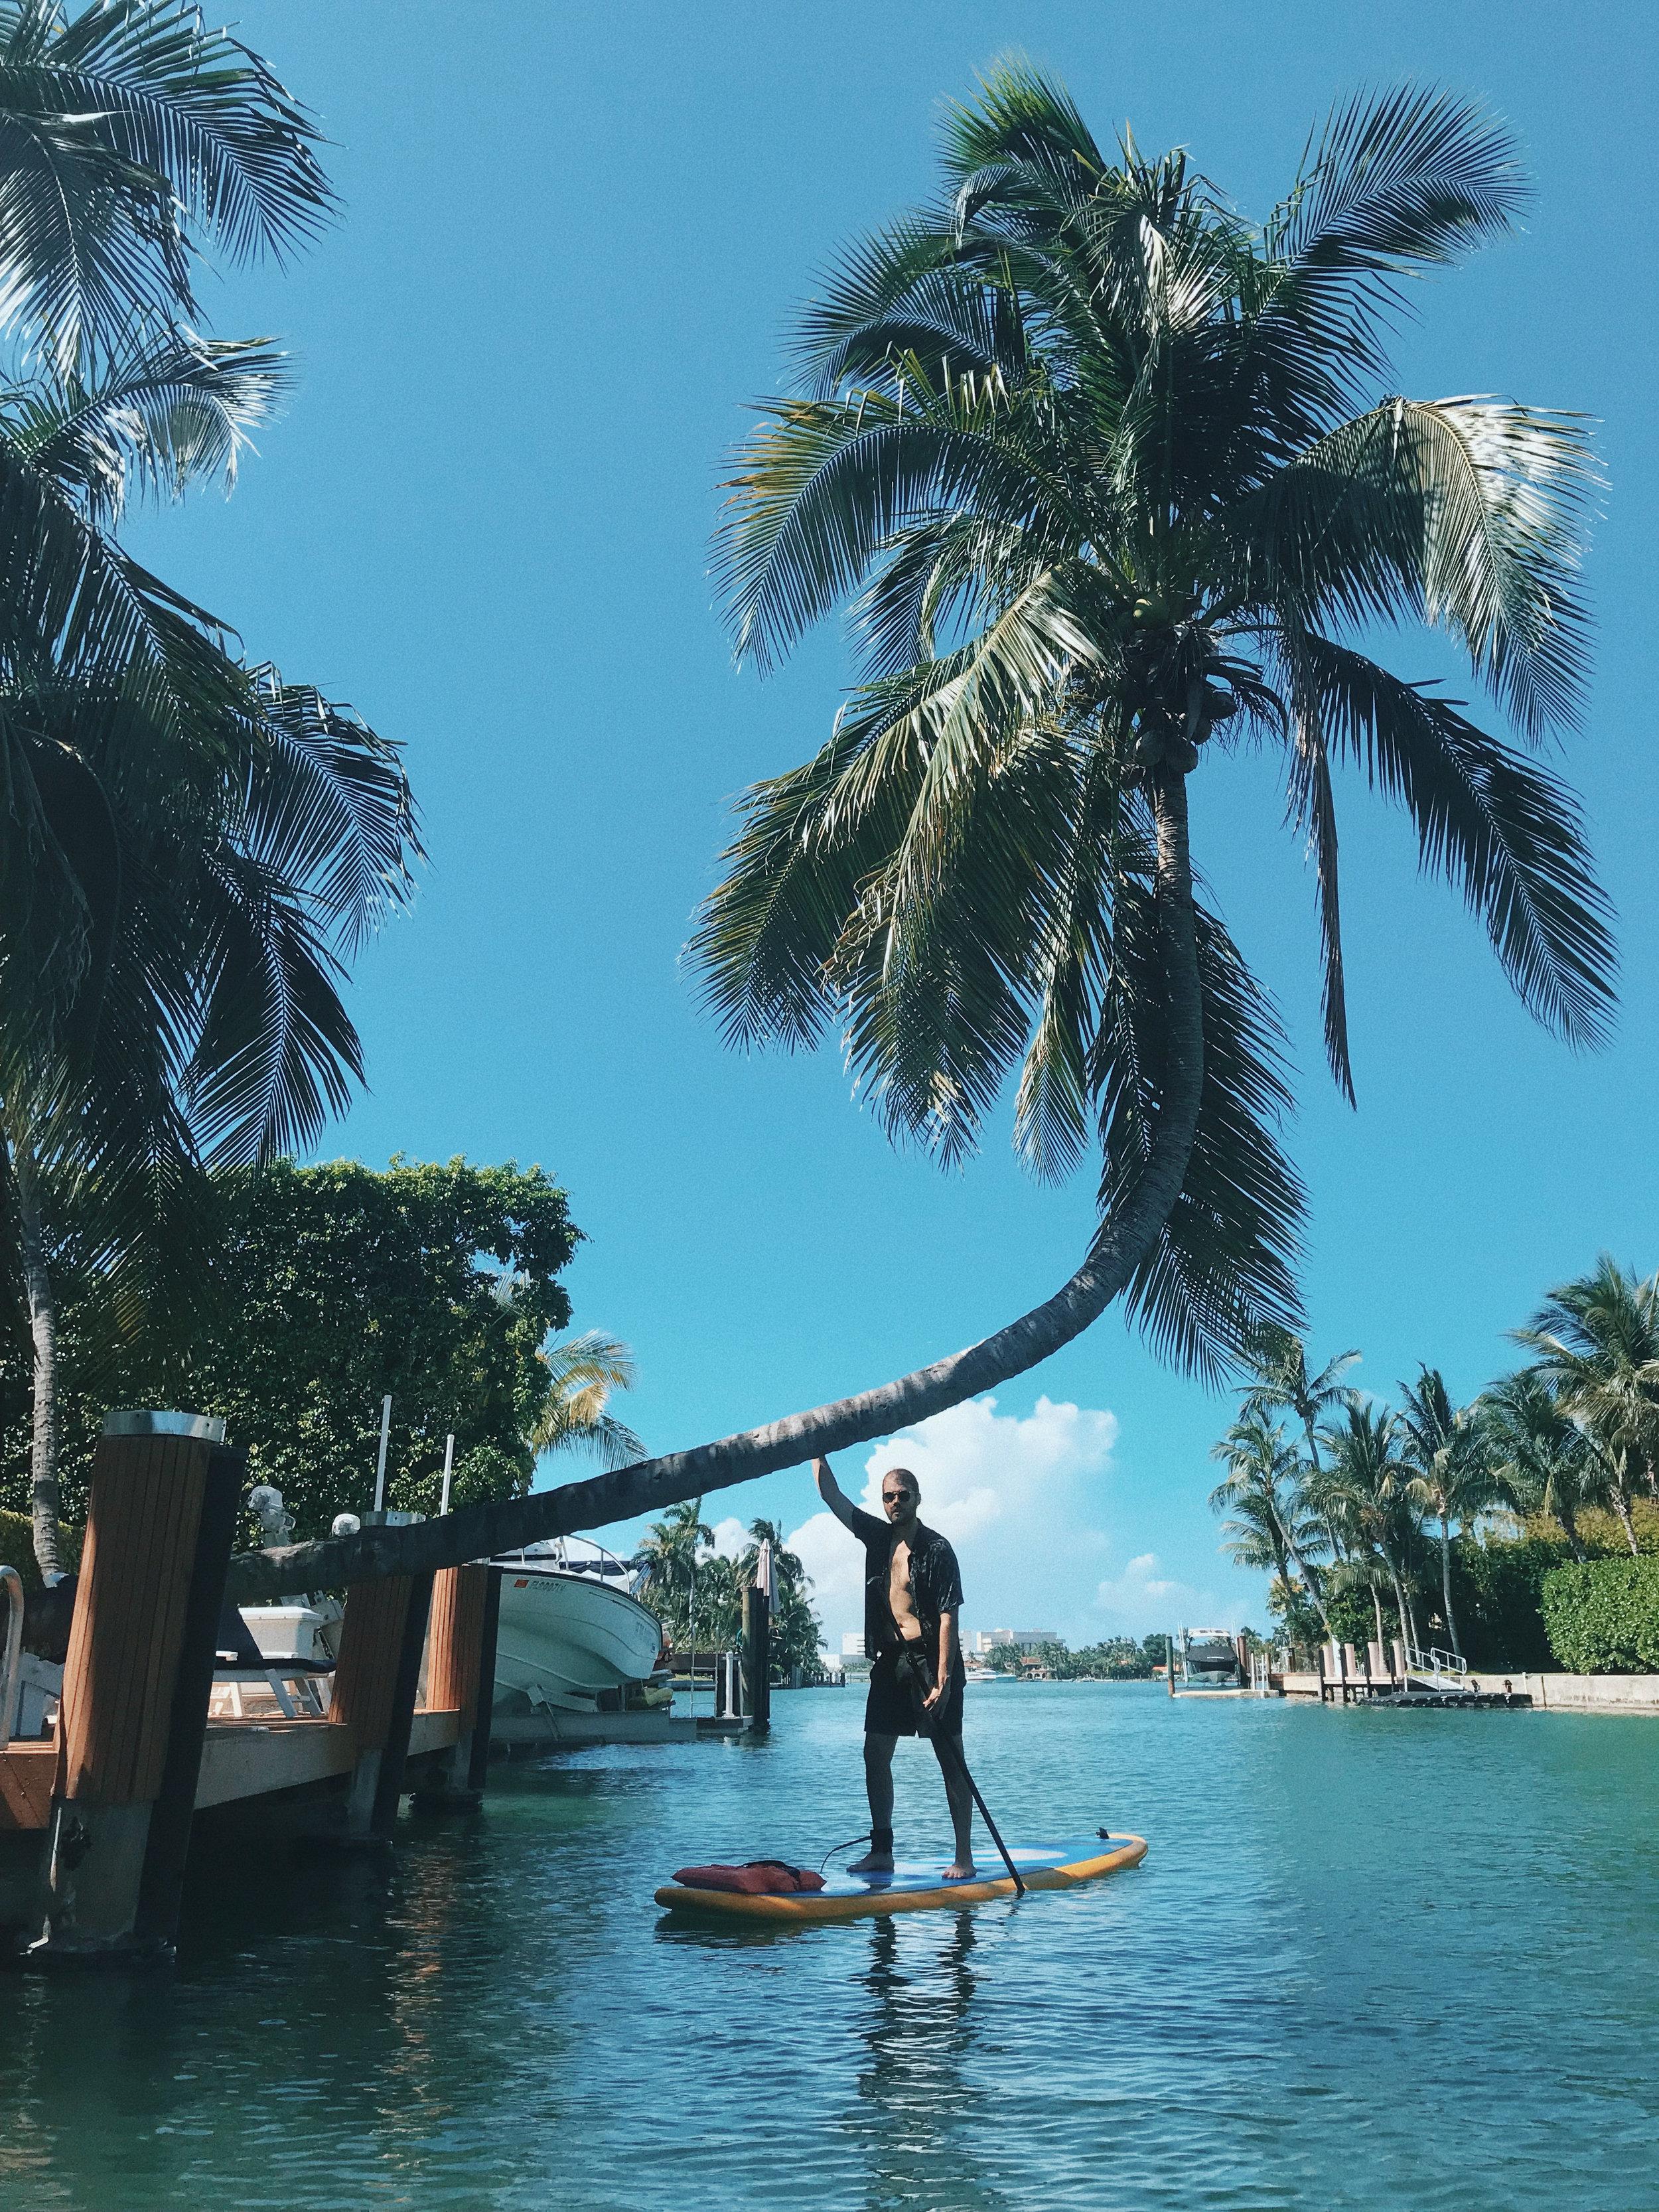 20180805_South Beach Kayak - Miami Beach Paddle Board_4.jpg